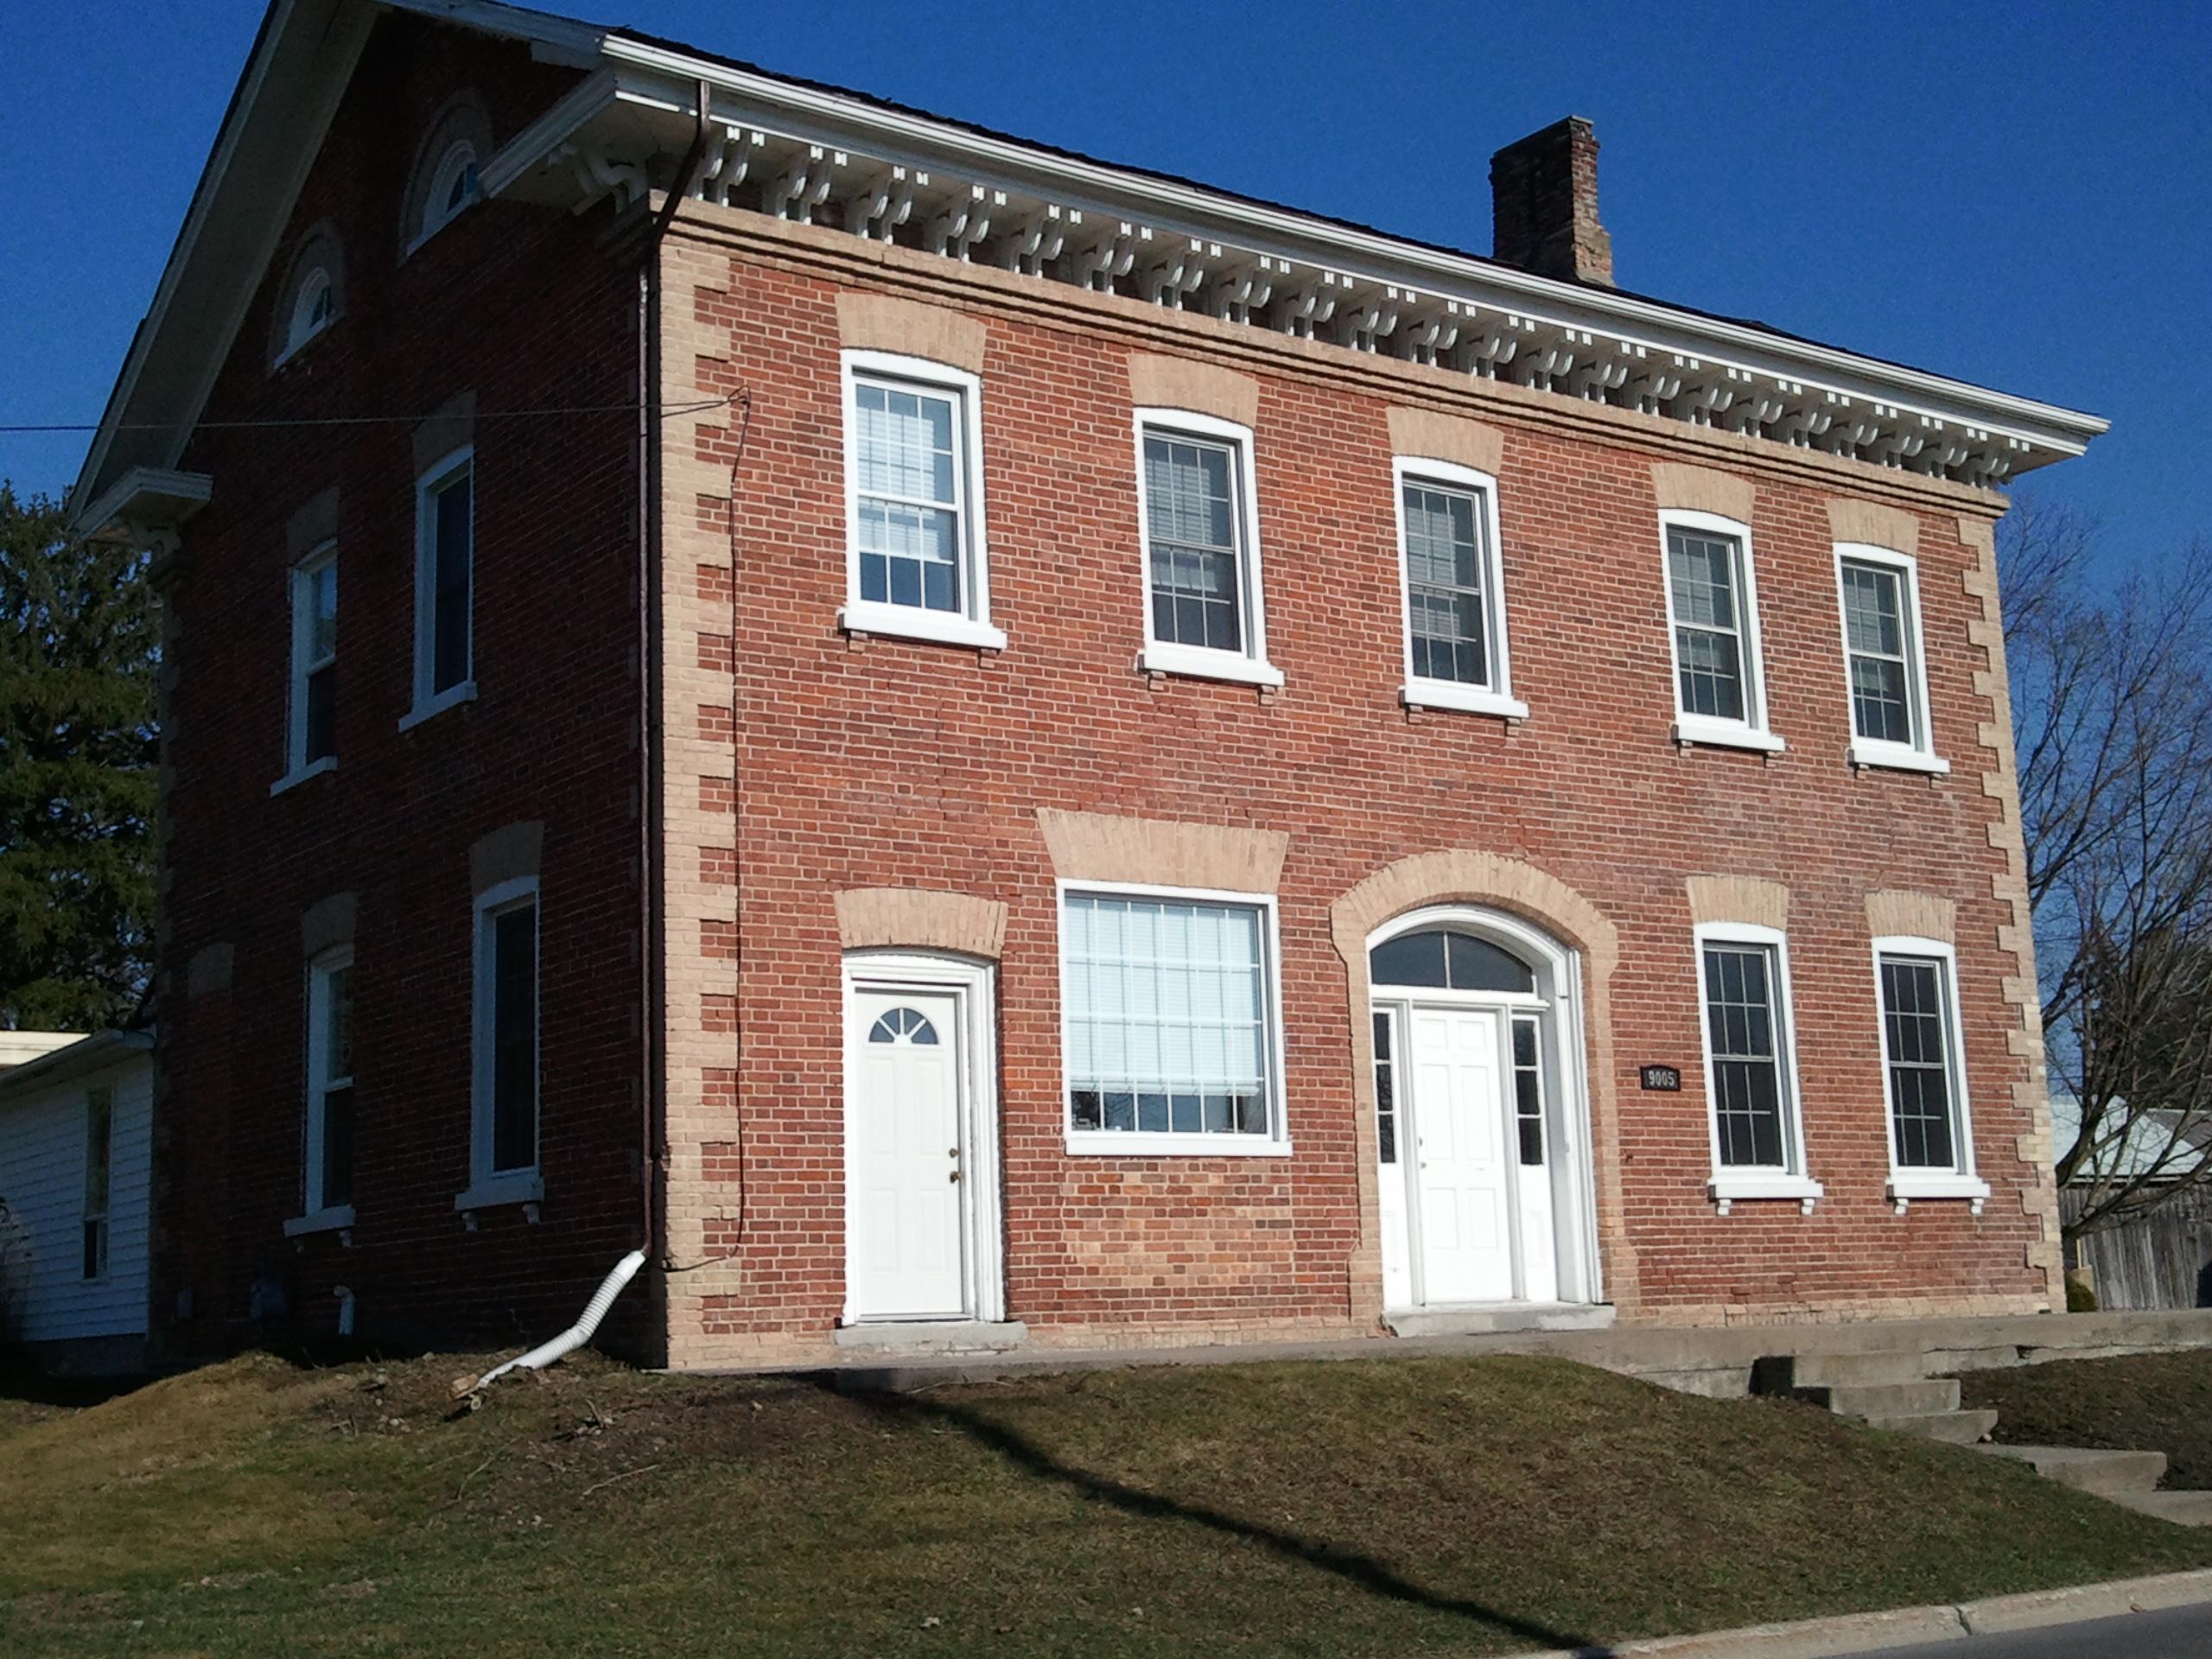 James_Matthewson_House,_built_1864,_7143_Ashburn_Rd.,_Ashburn,_Ontario.jpg